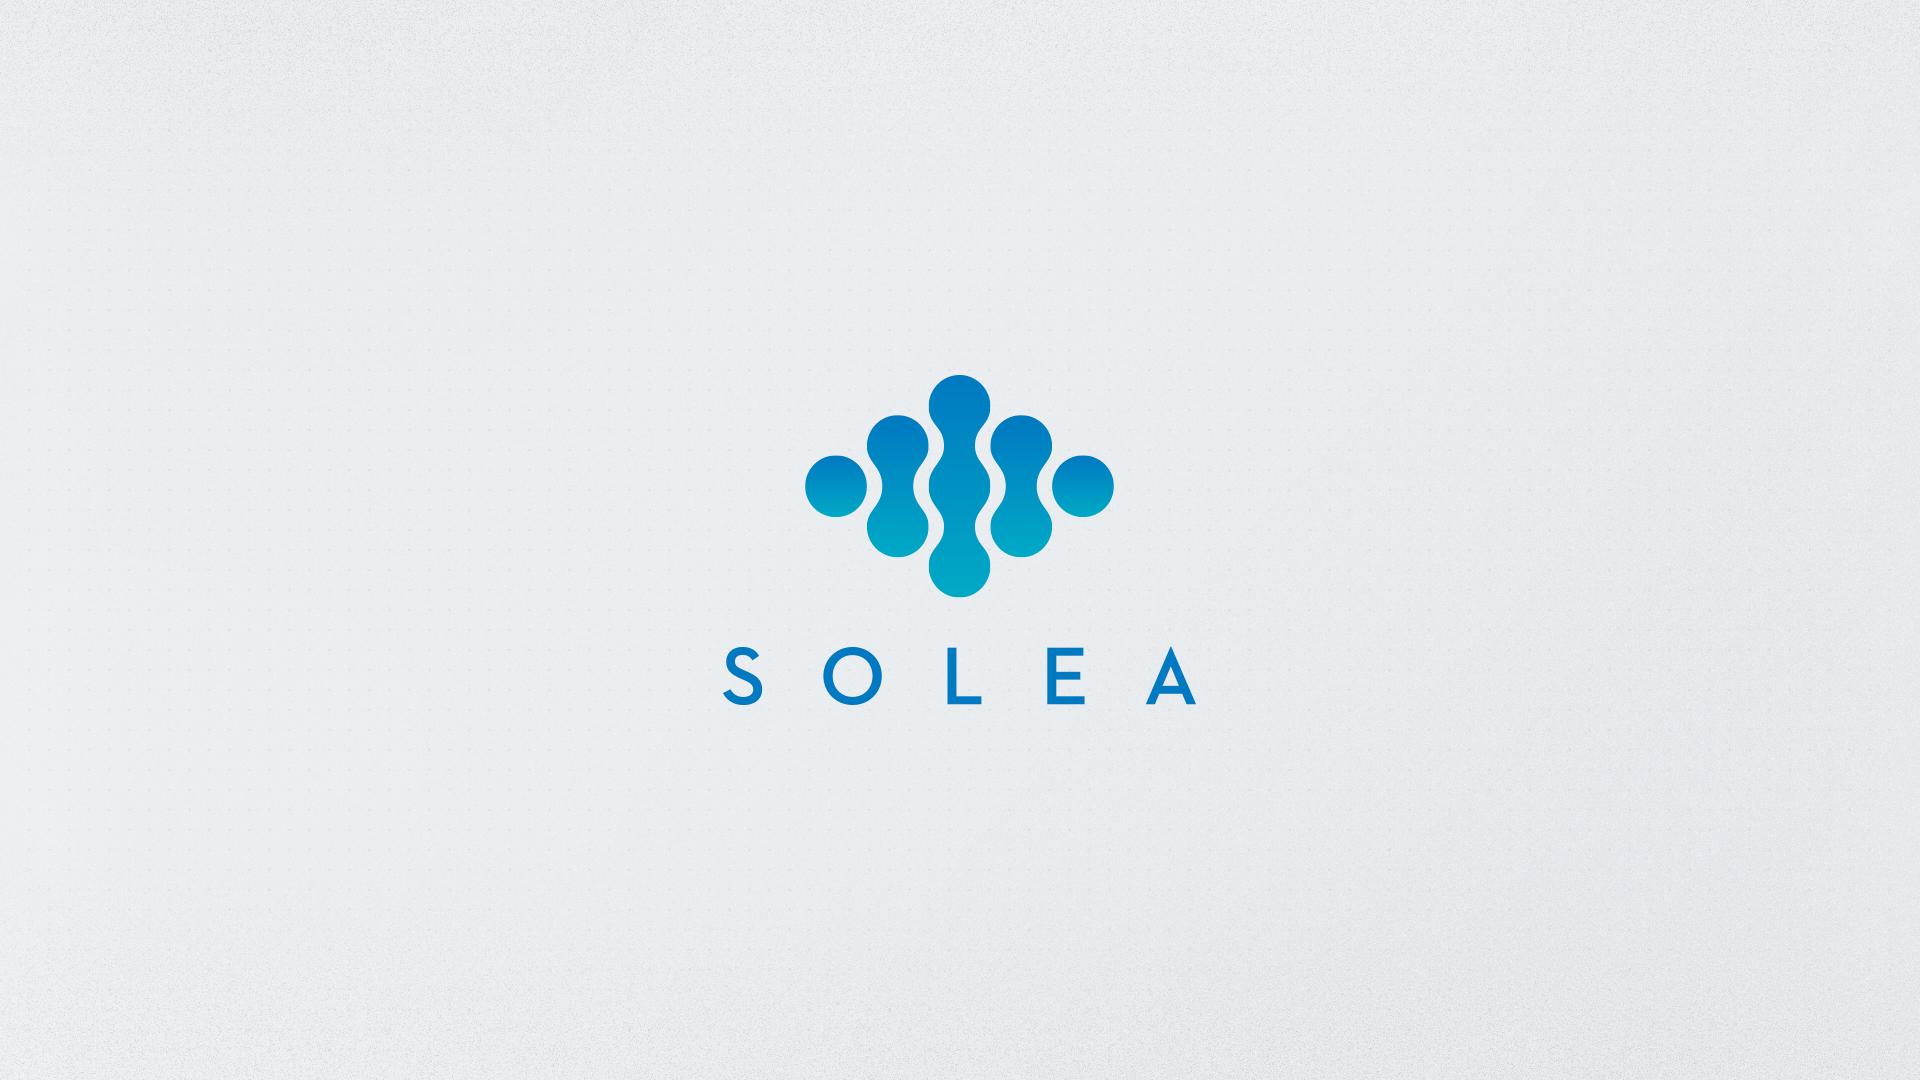 Solea_Styleframes_0060_62.jpg